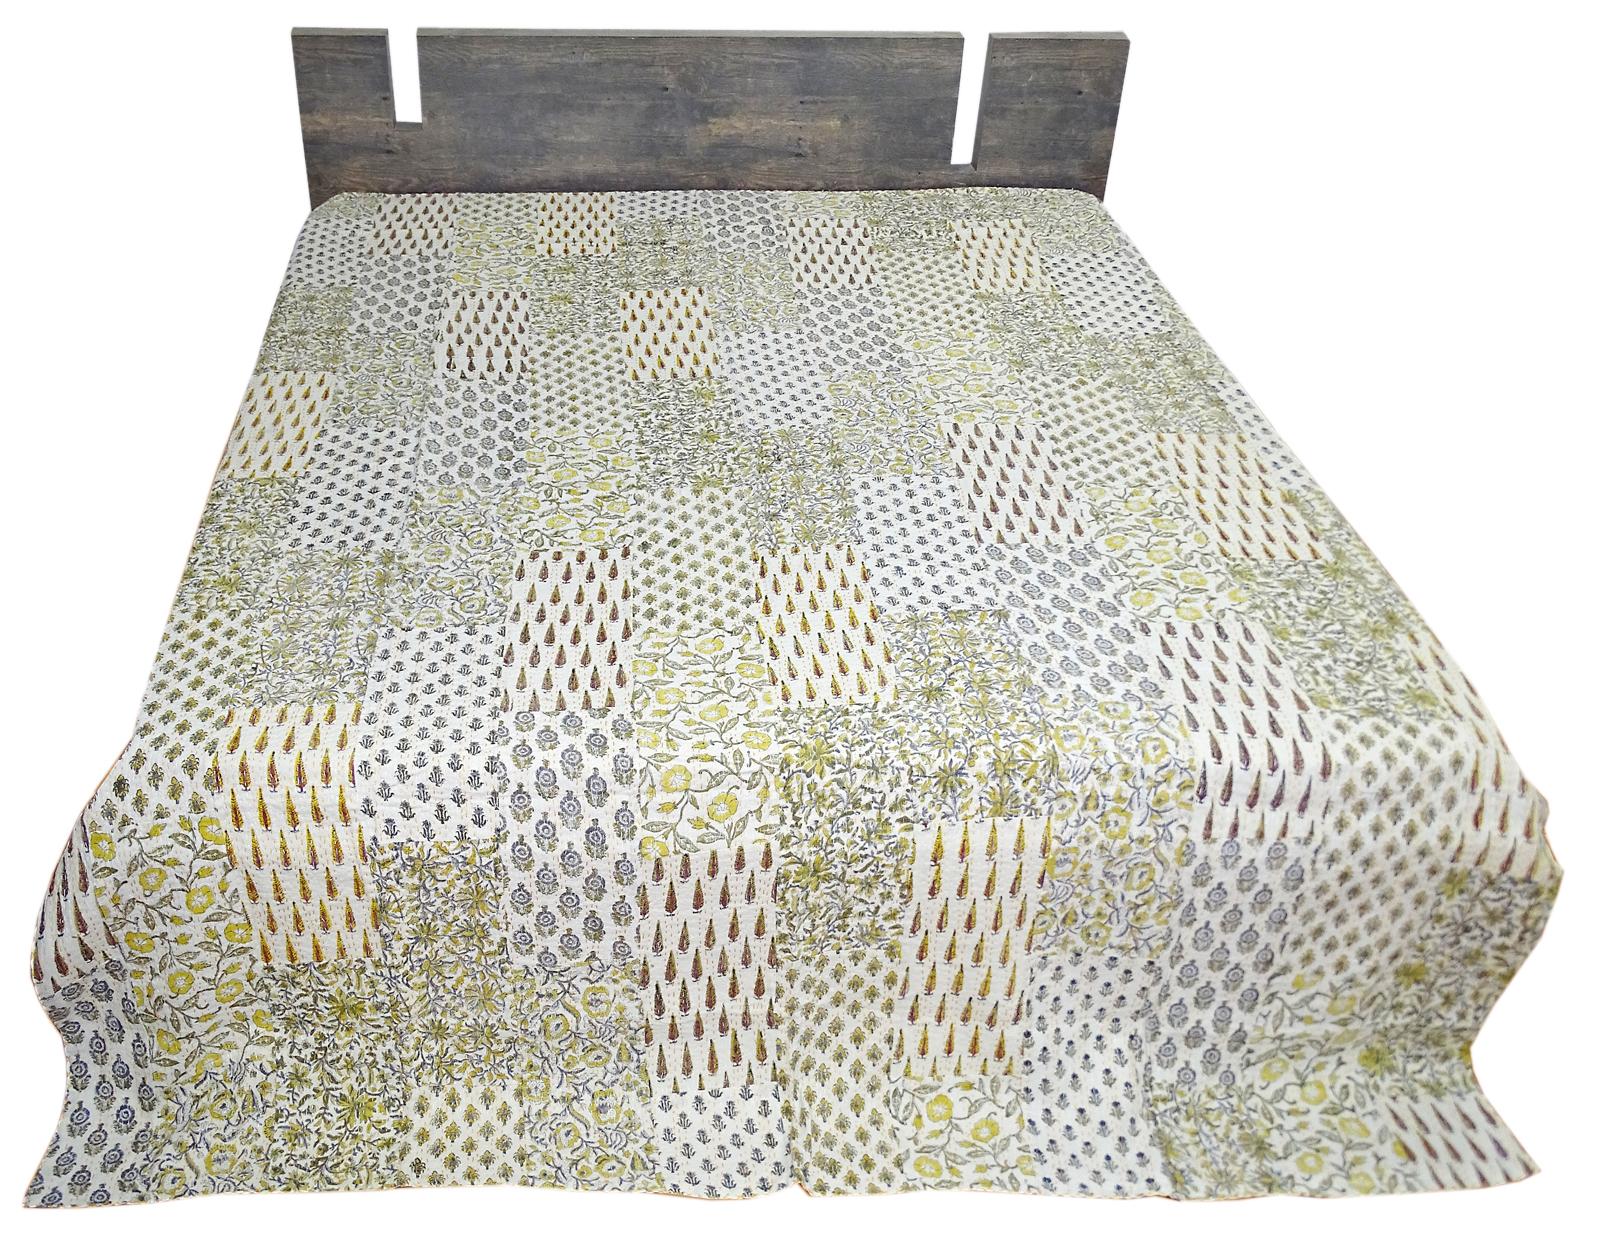 Hand Block Print Kantha Quilt King Size